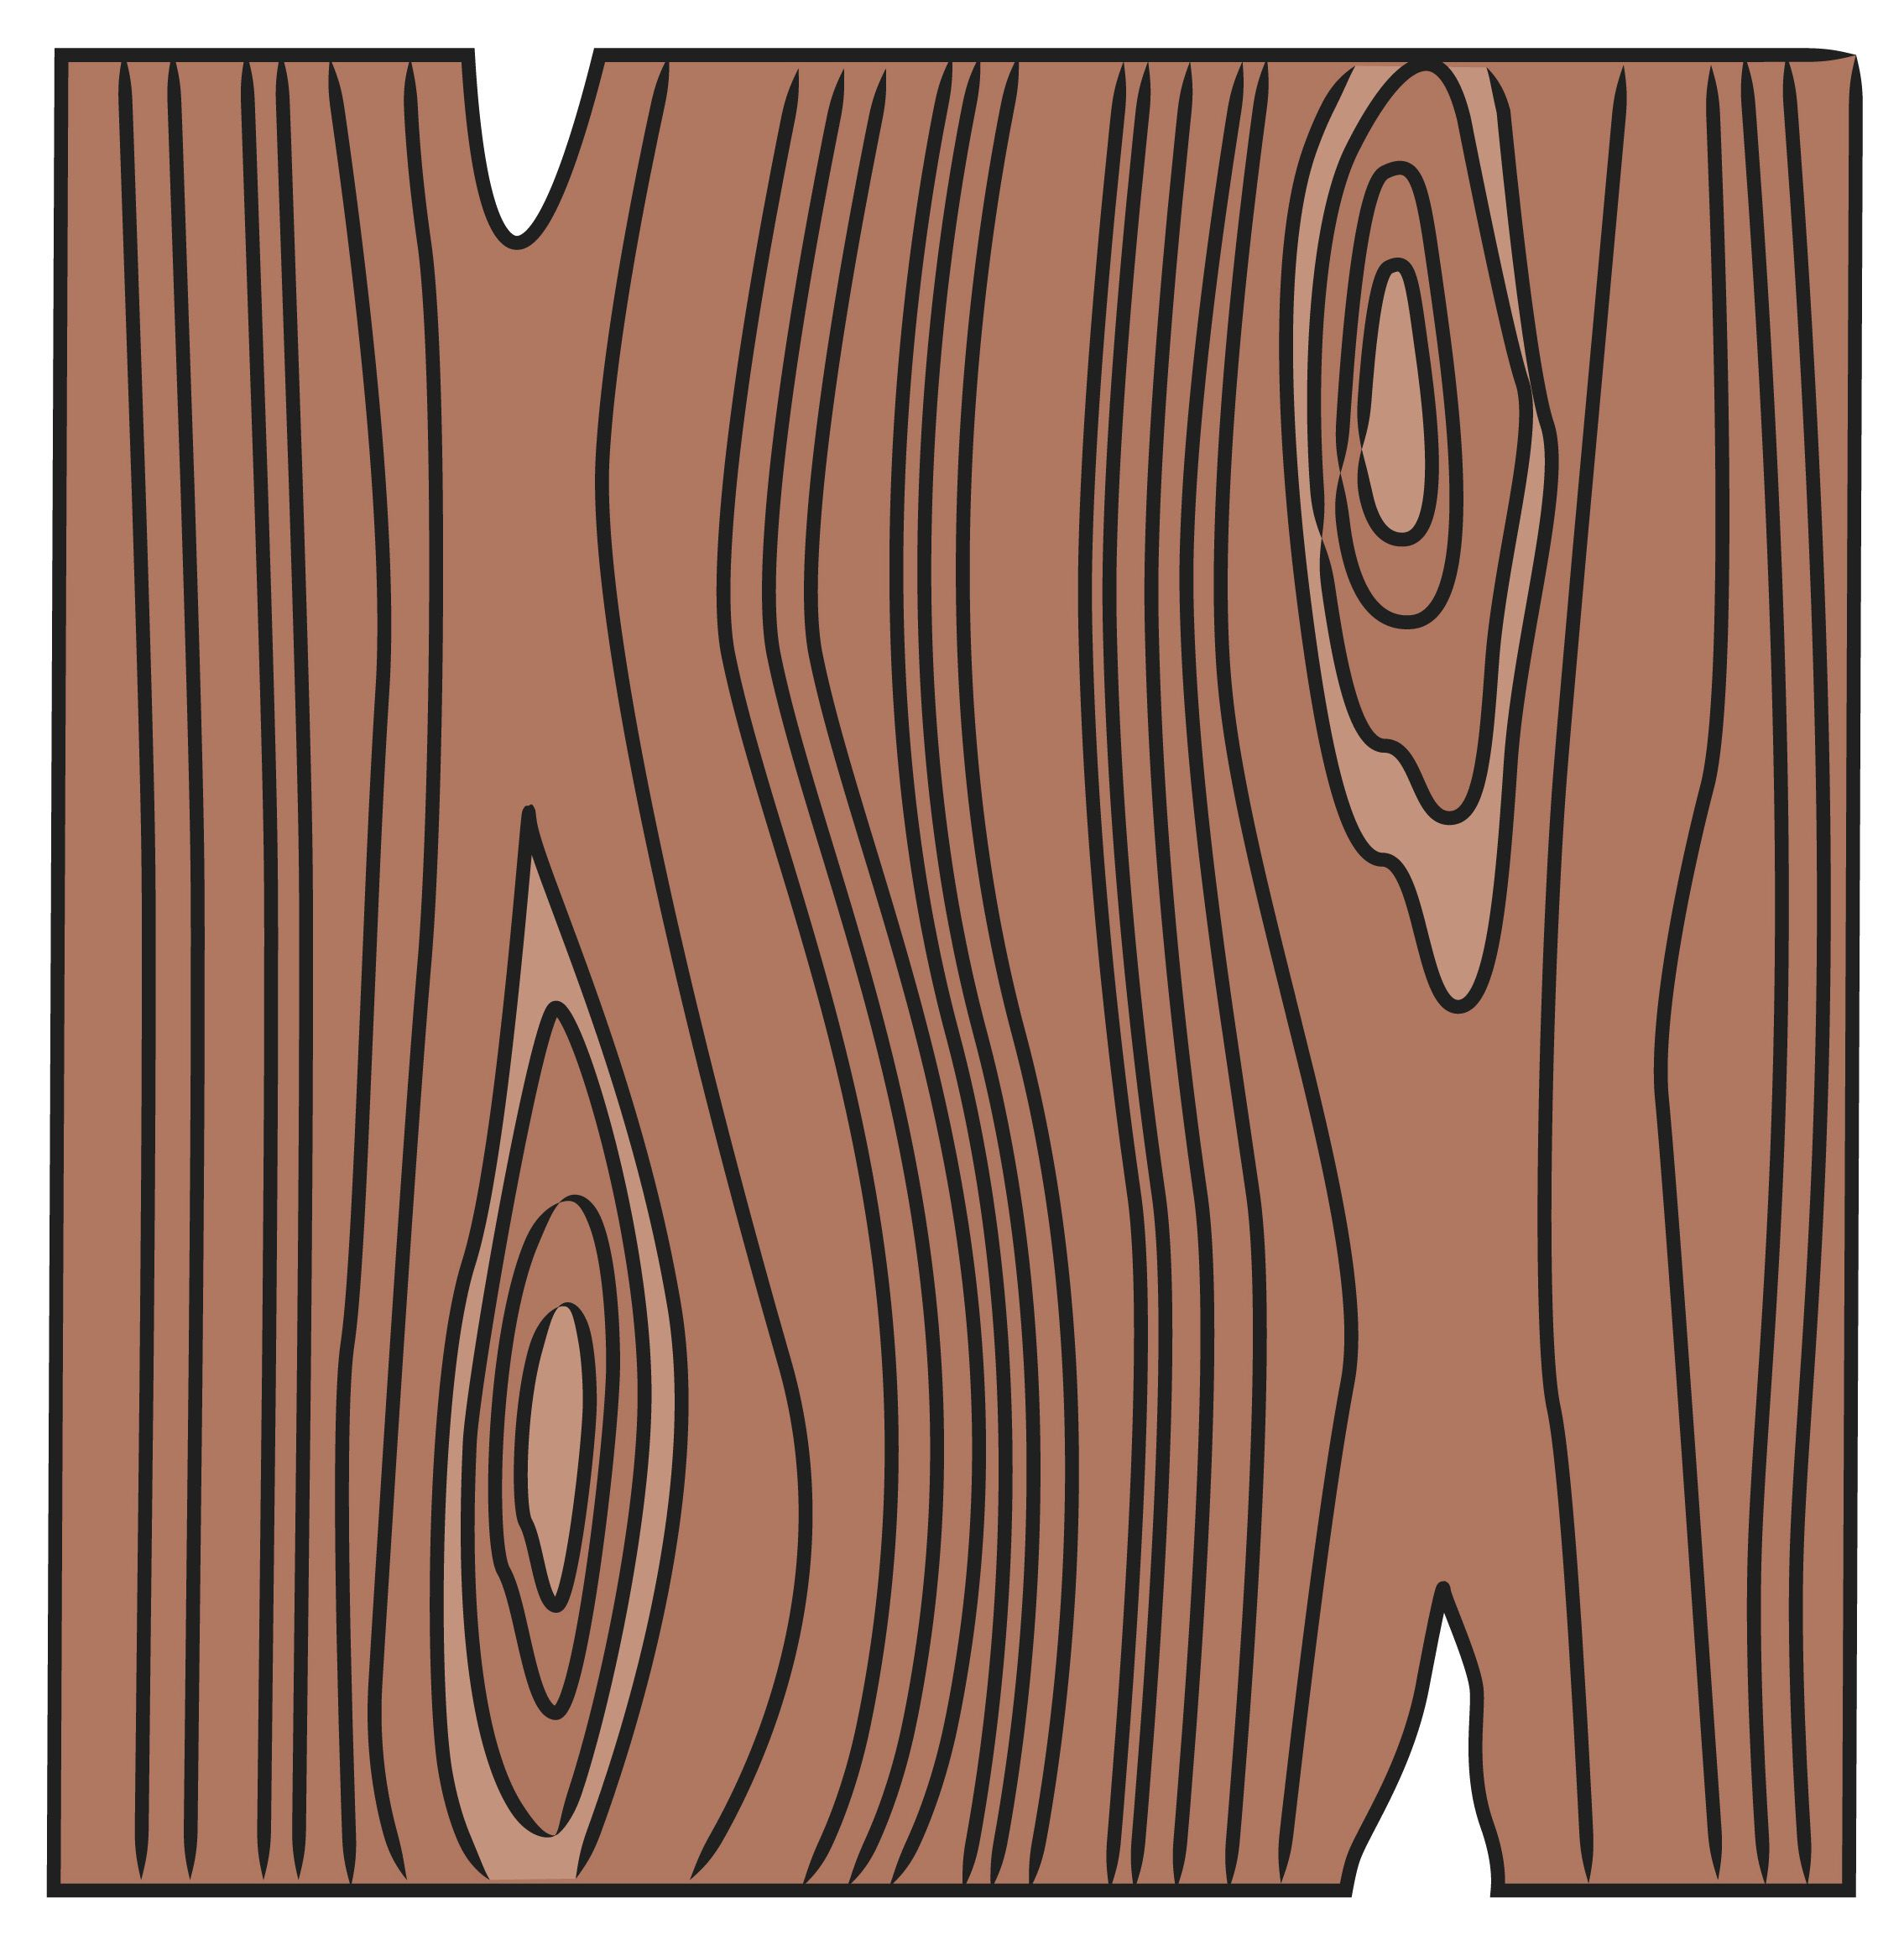 Line Art Wood Grain : Piece of wood drawing pixshark images